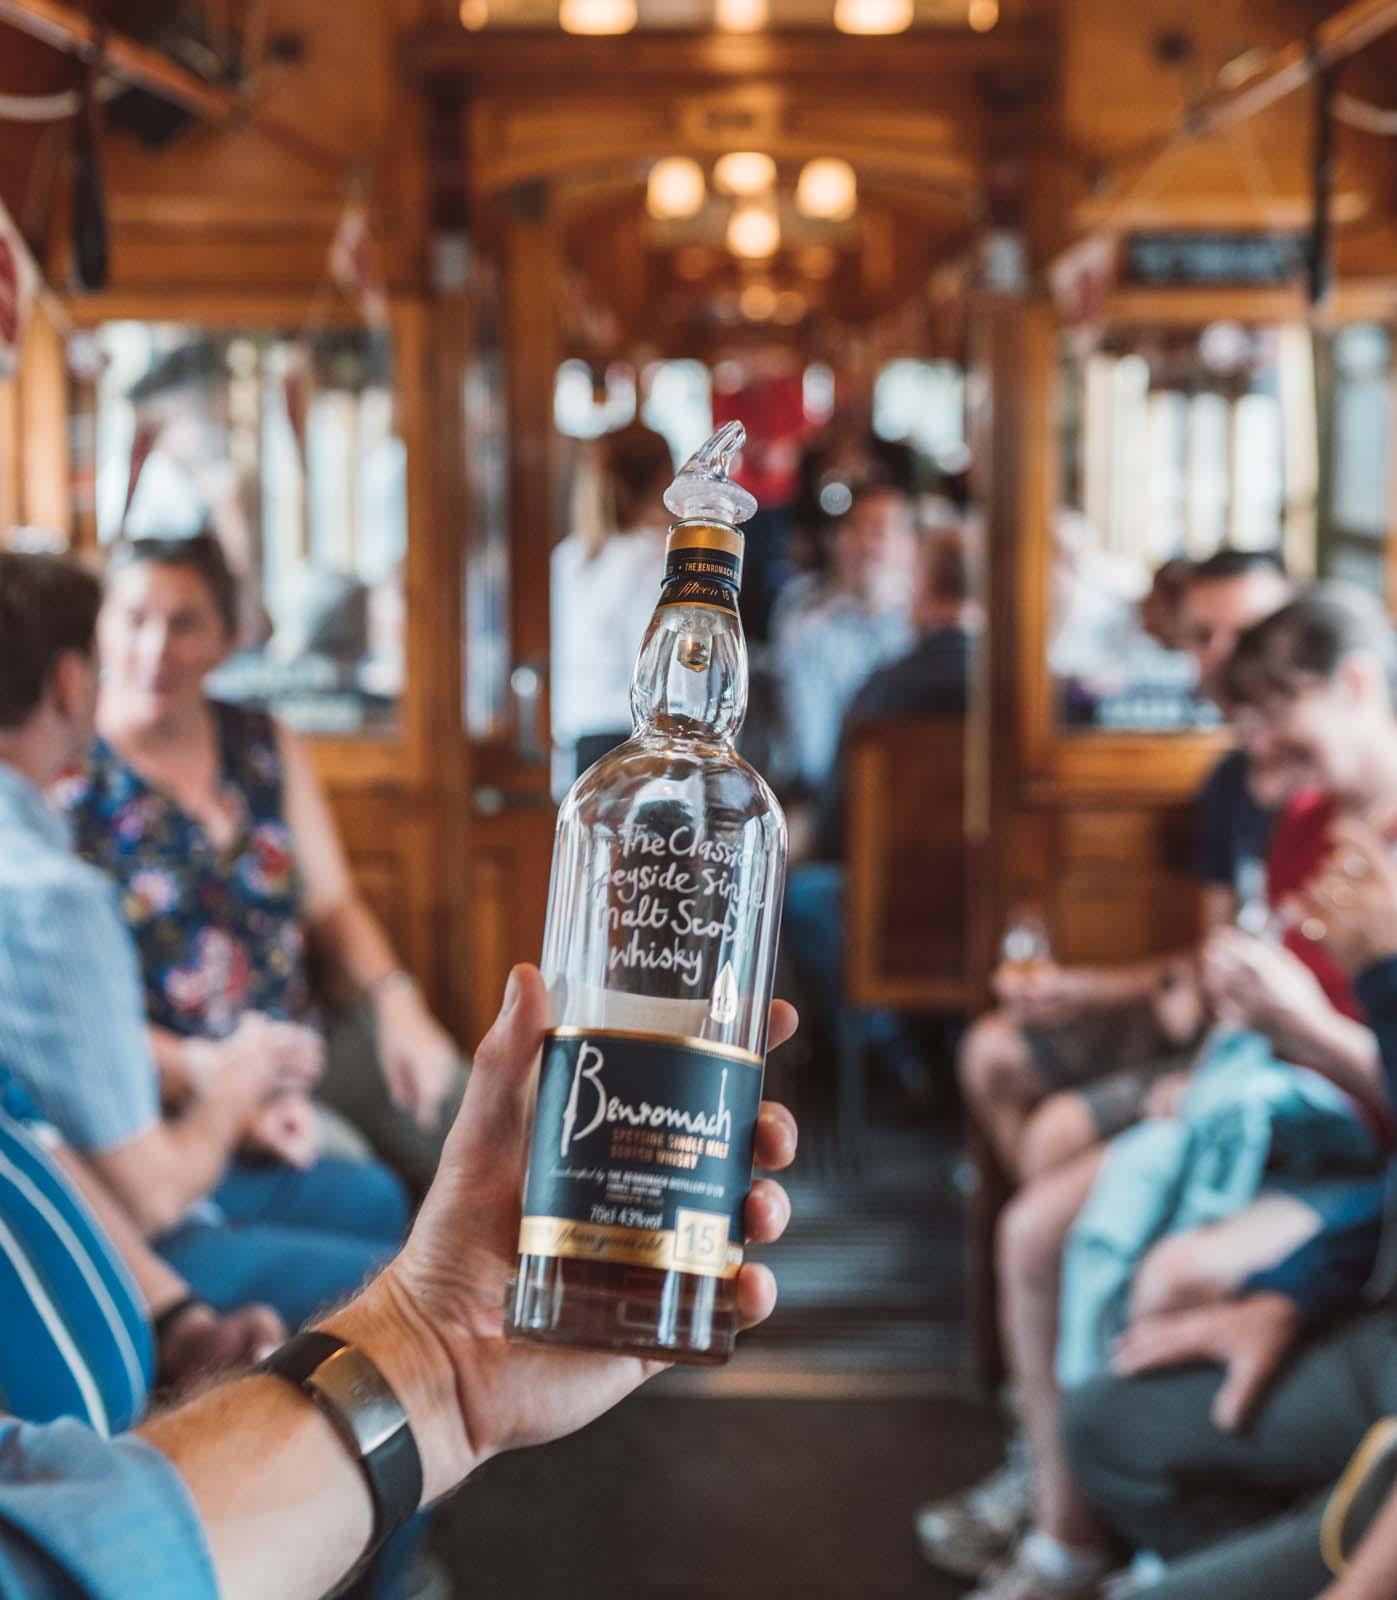 Dramfest 2018 for Whisky Galore-502.jpg